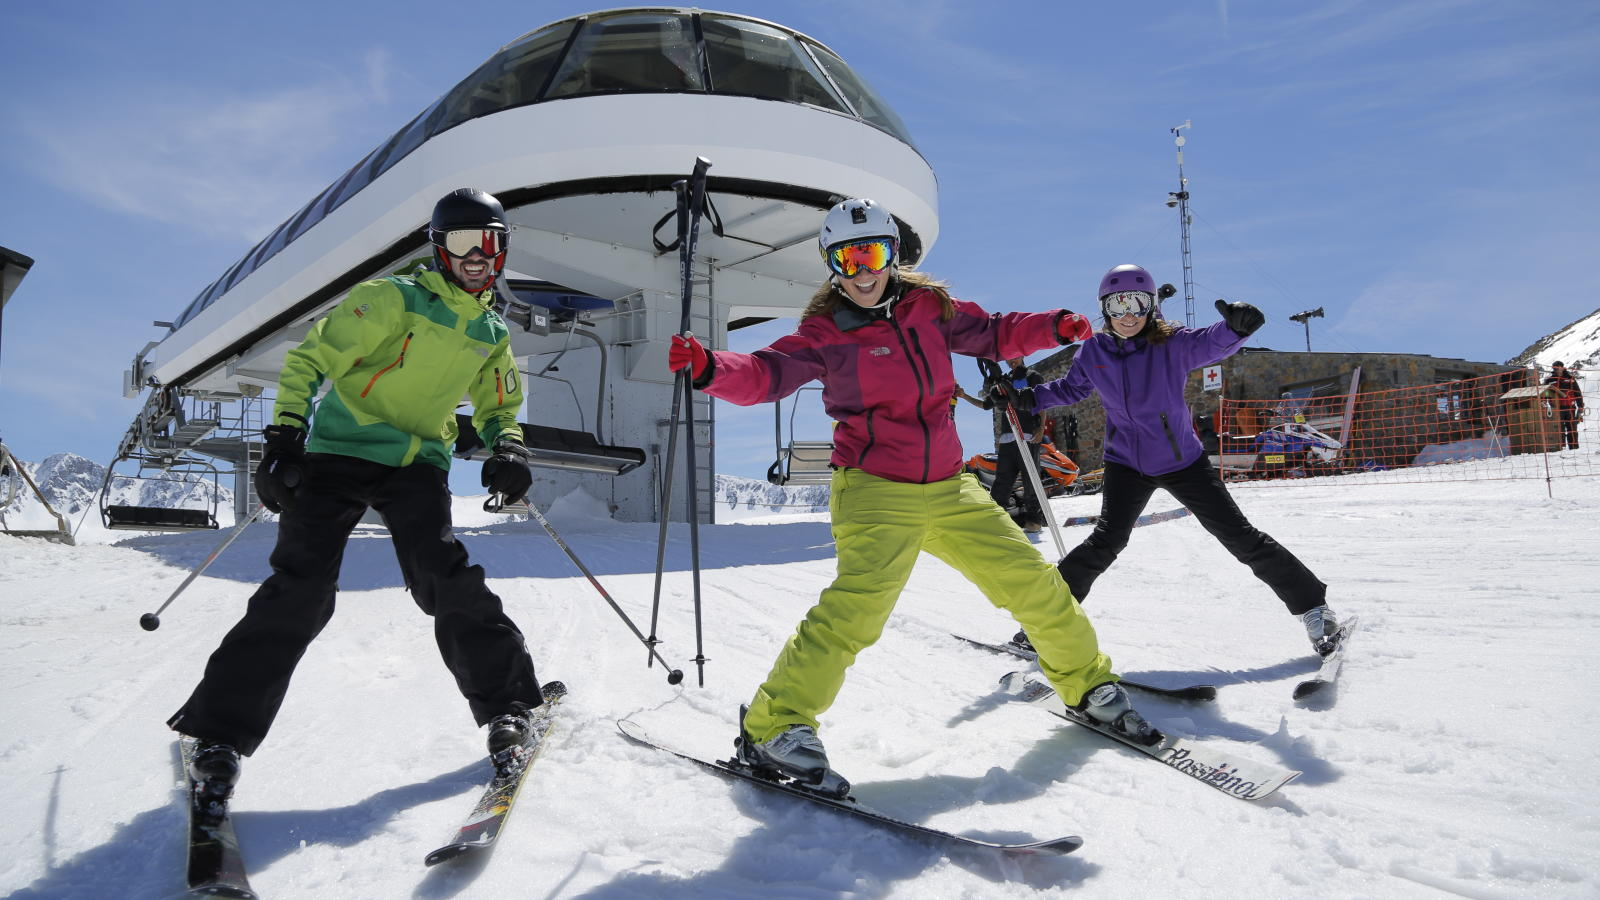 ski andorra 2015 andorra ski holidays skiing andorra. Black Bedroom Furniture Sets. Home Design Ideas